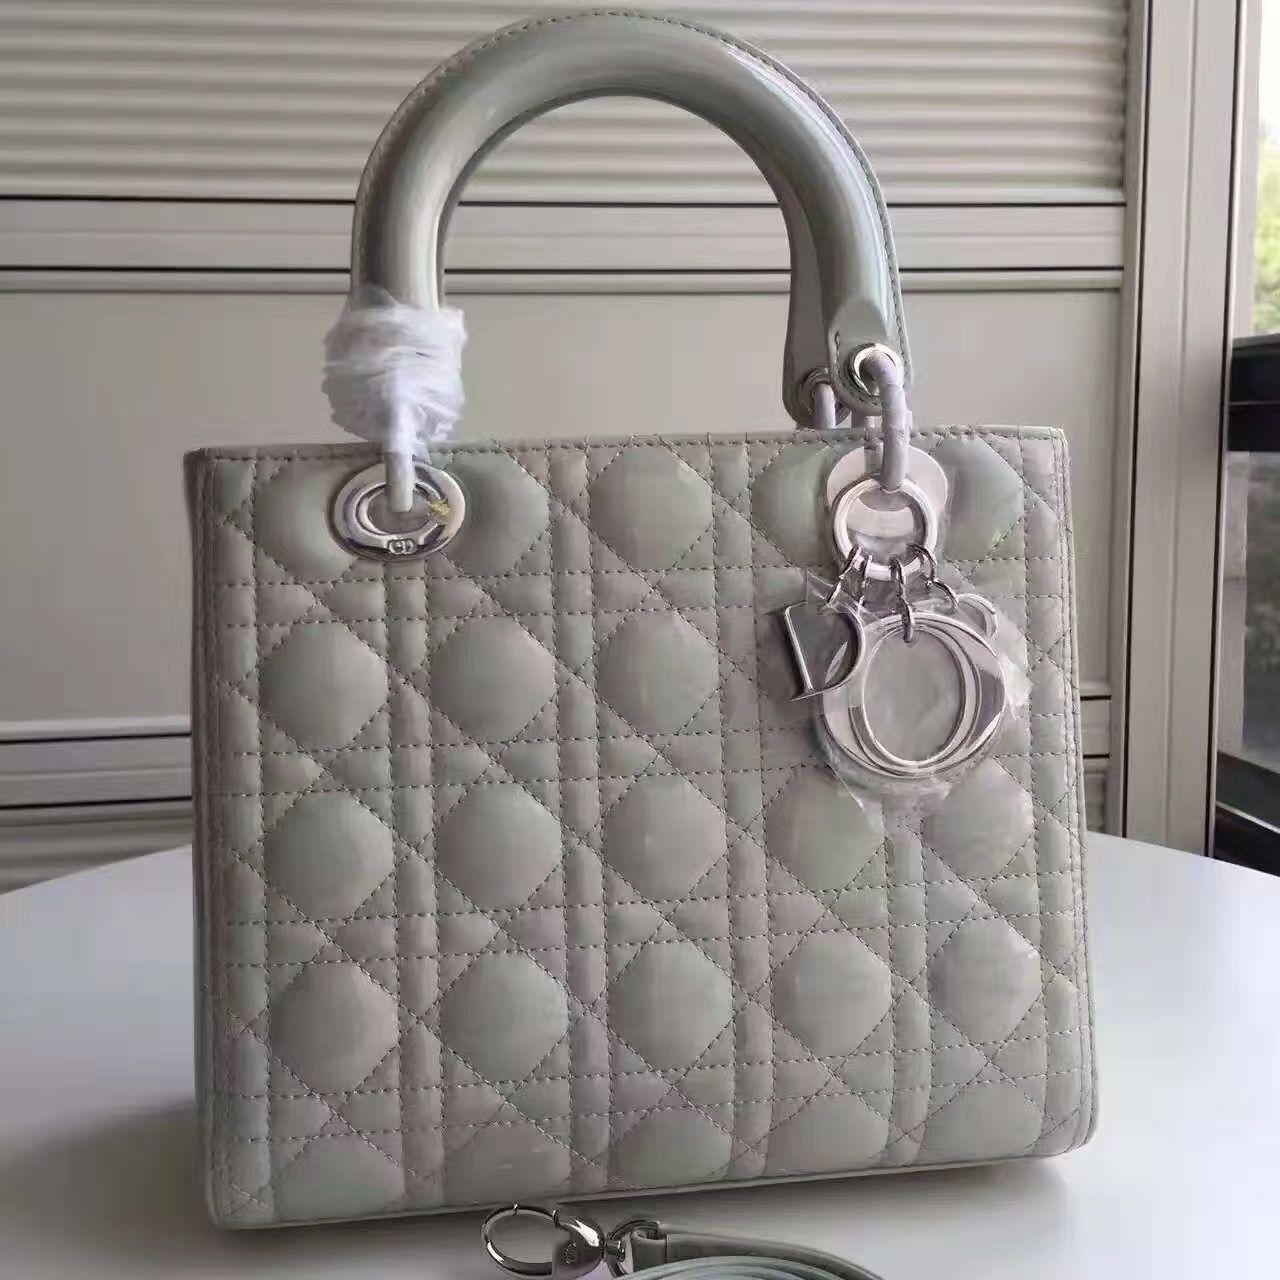 Dior Lady Dior Medium Bag In Patent Leather Gray (SH)   Dior Lady ... f003ce82c5